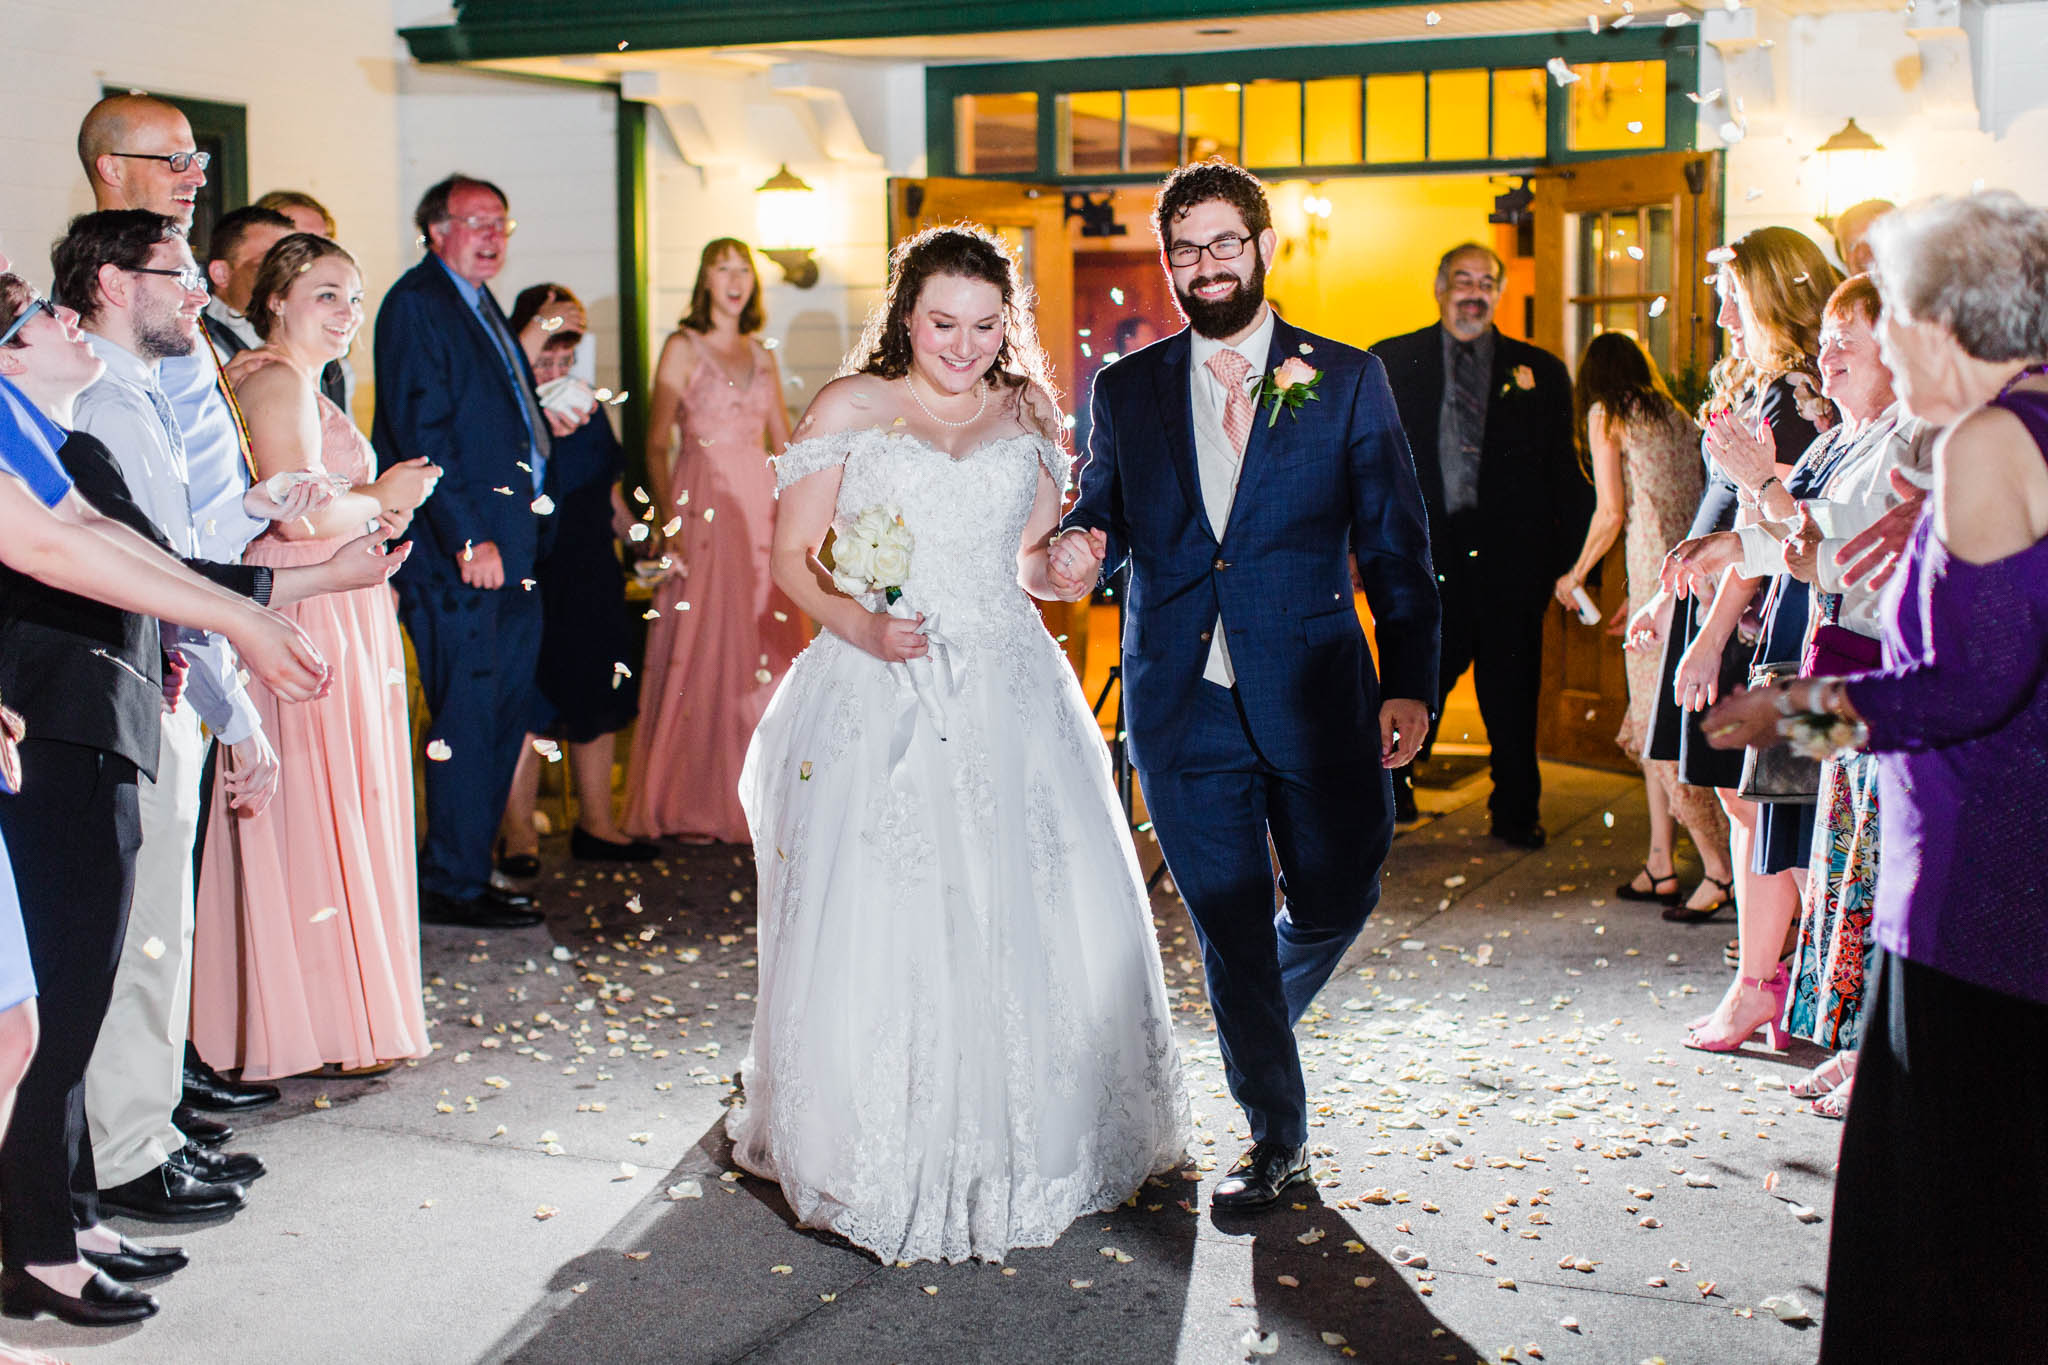 lynchburg-virginia-wedding-photographer-196.jpg